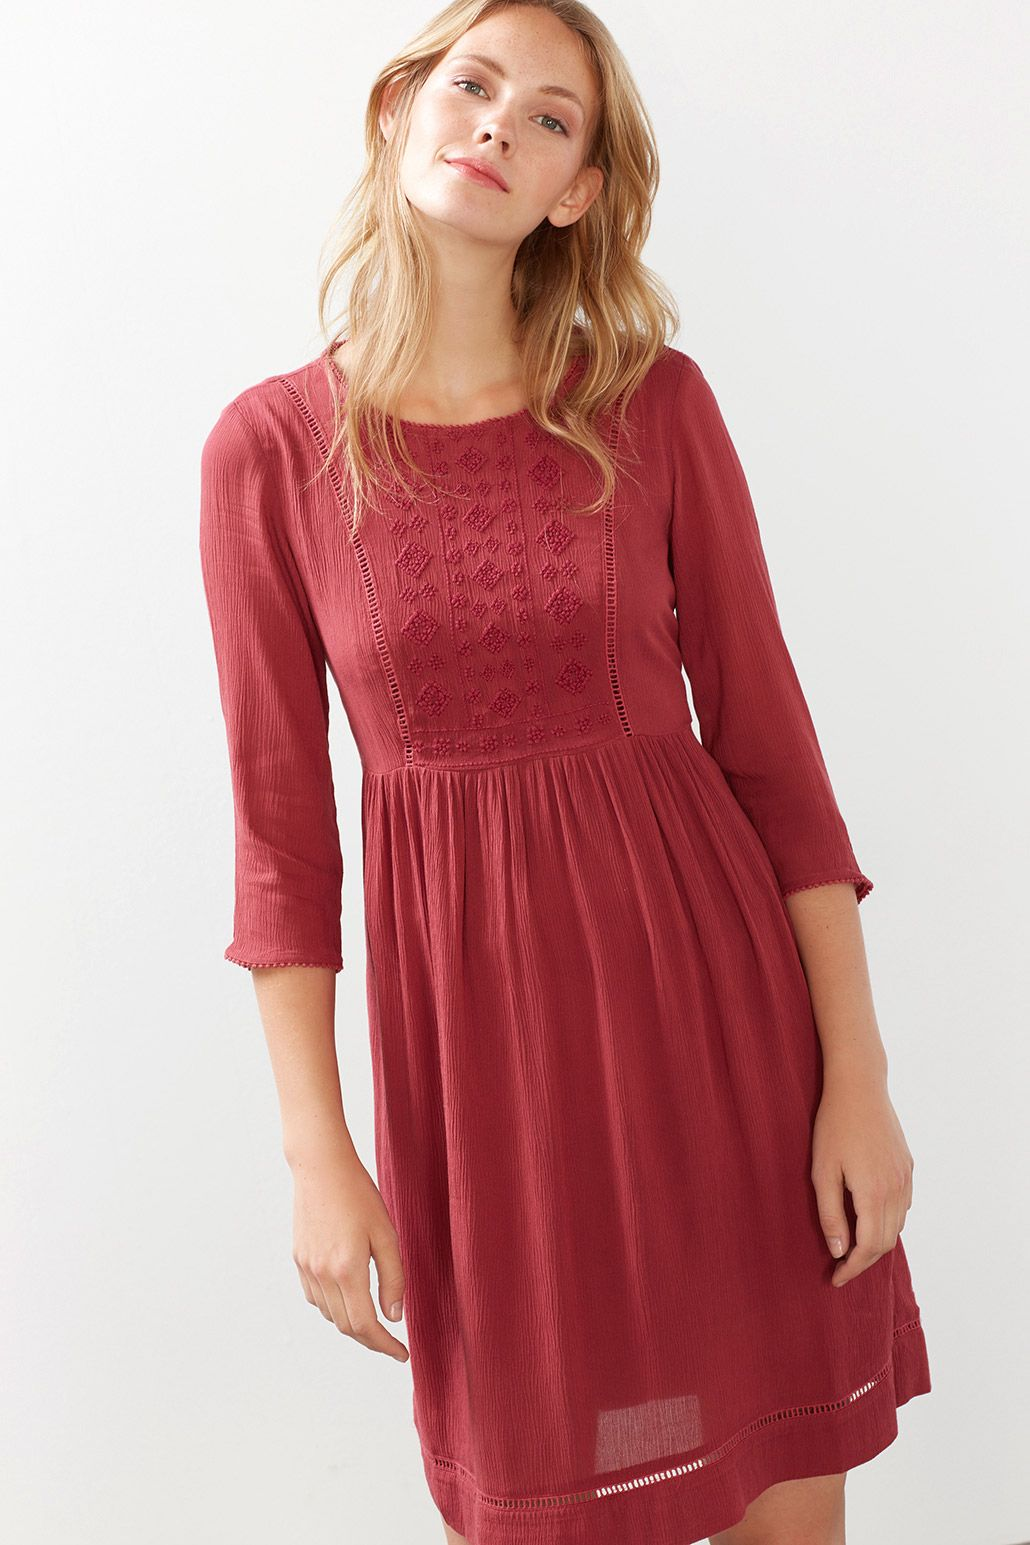 Esprit / Fließendes Crinkle-Kleid  Dresses, Fashion, Clothes